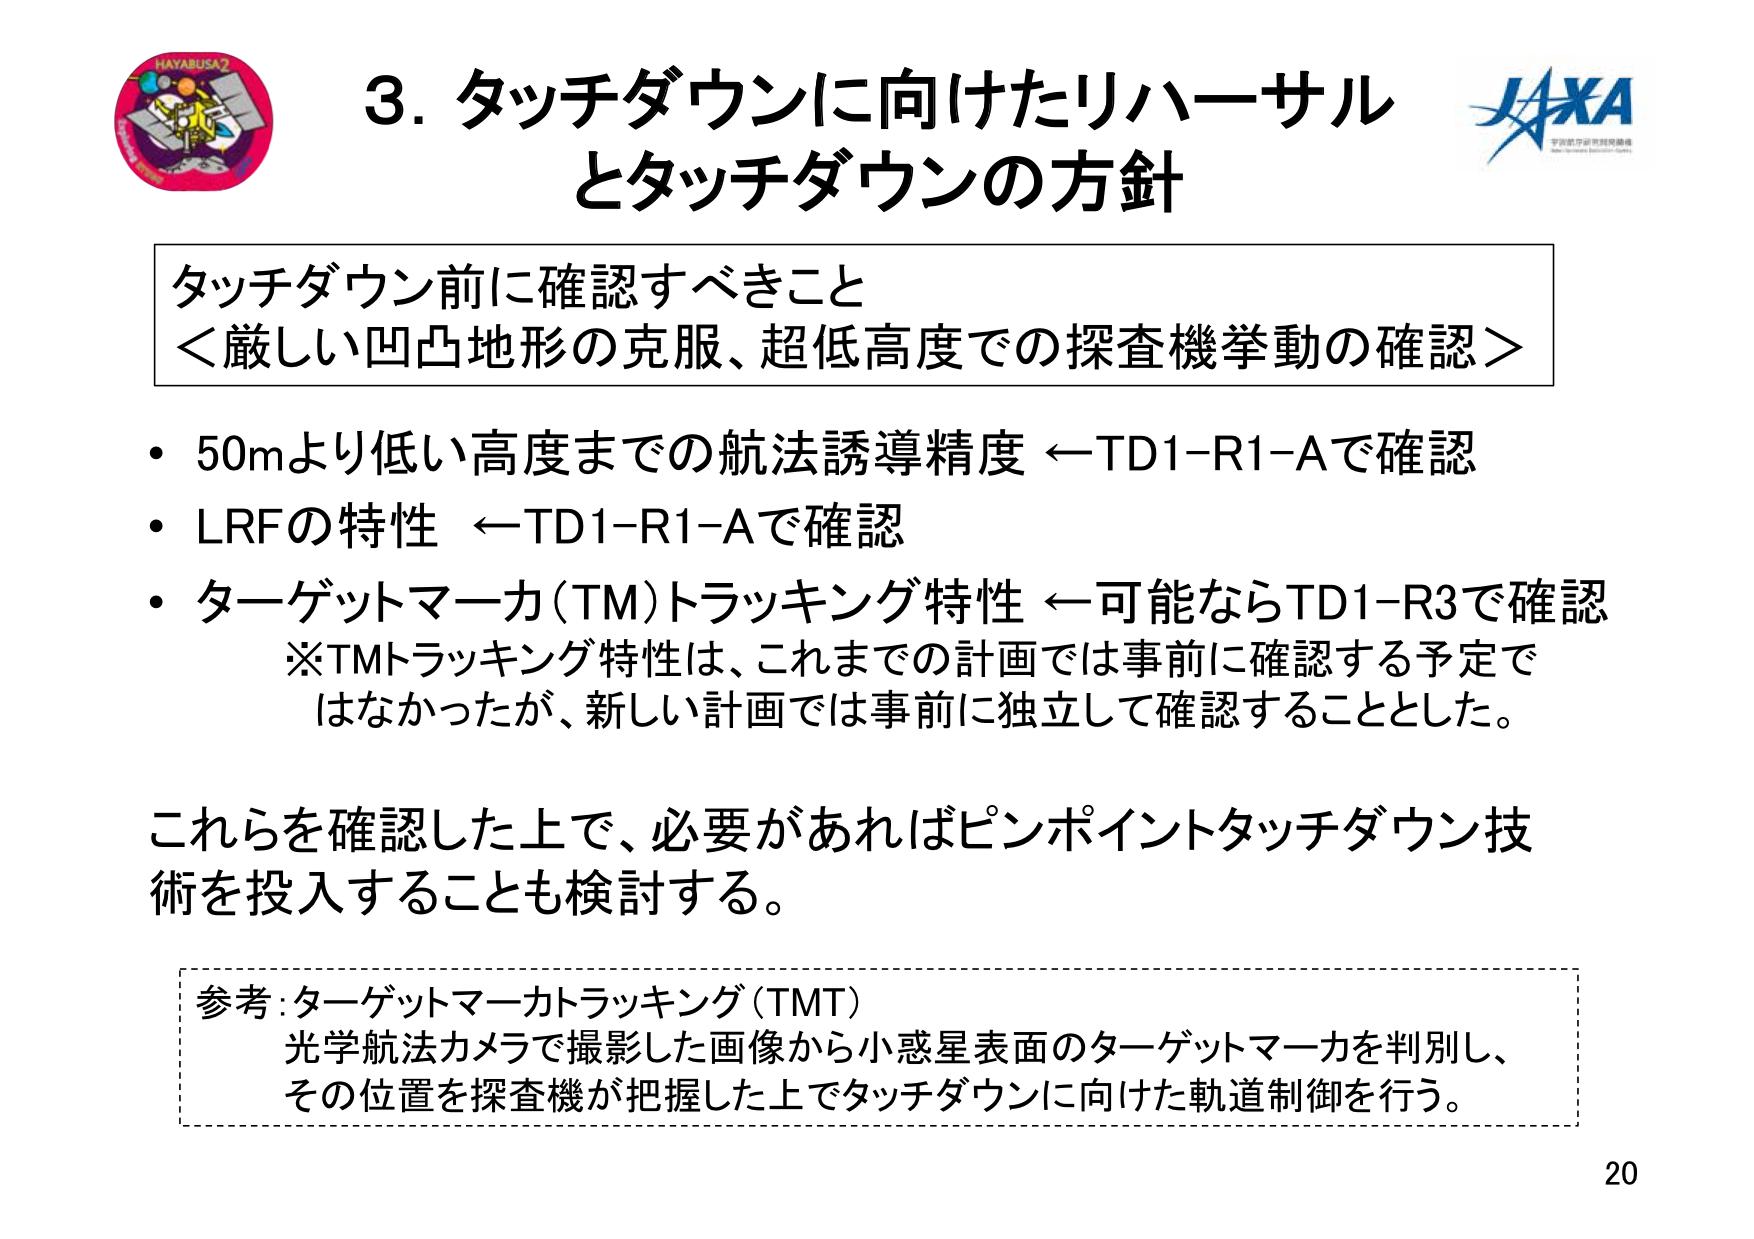 f:id:Imamura:20181011153959p:plain